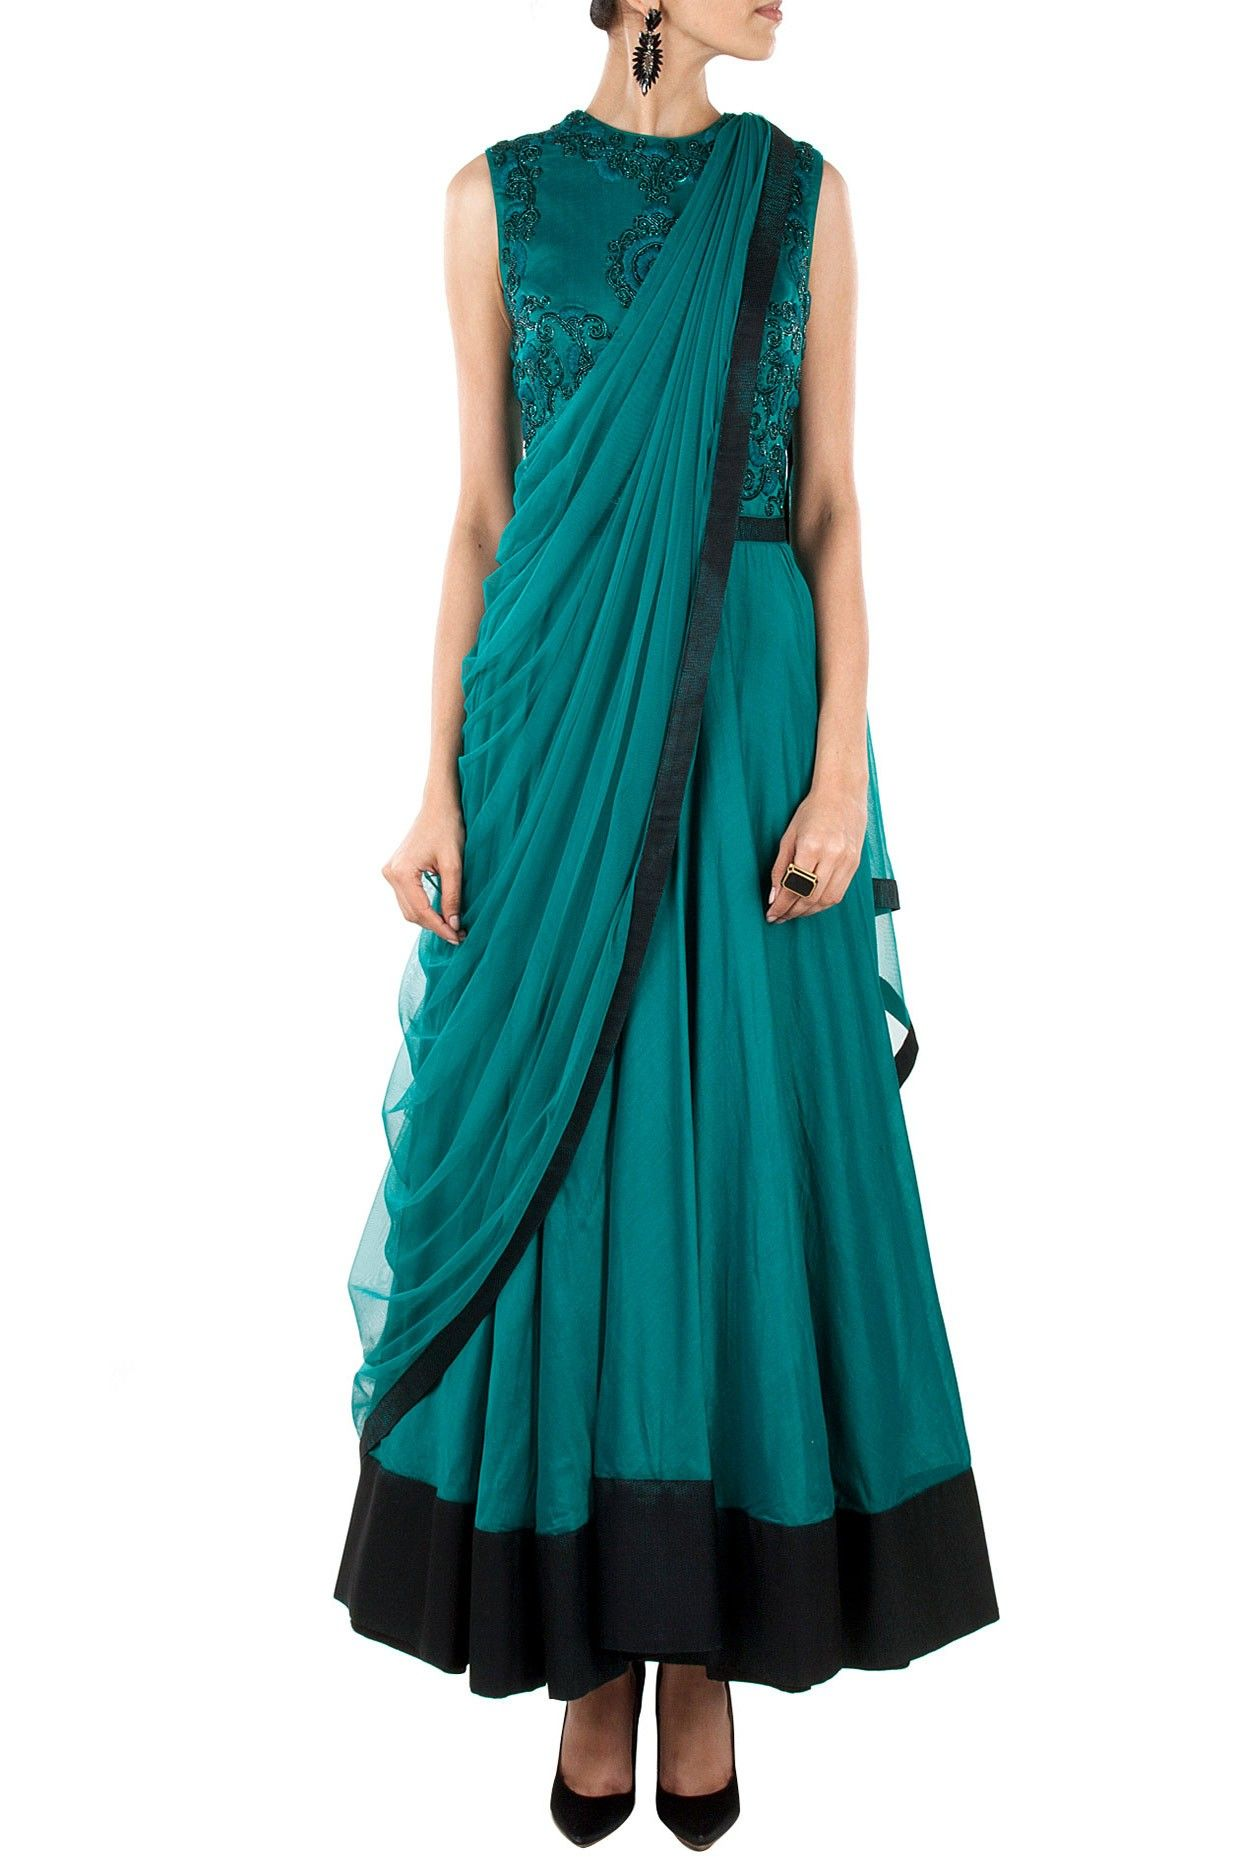 J by Jannat | dresses | Pinterest | Designer jewellery, Anarkali and ...